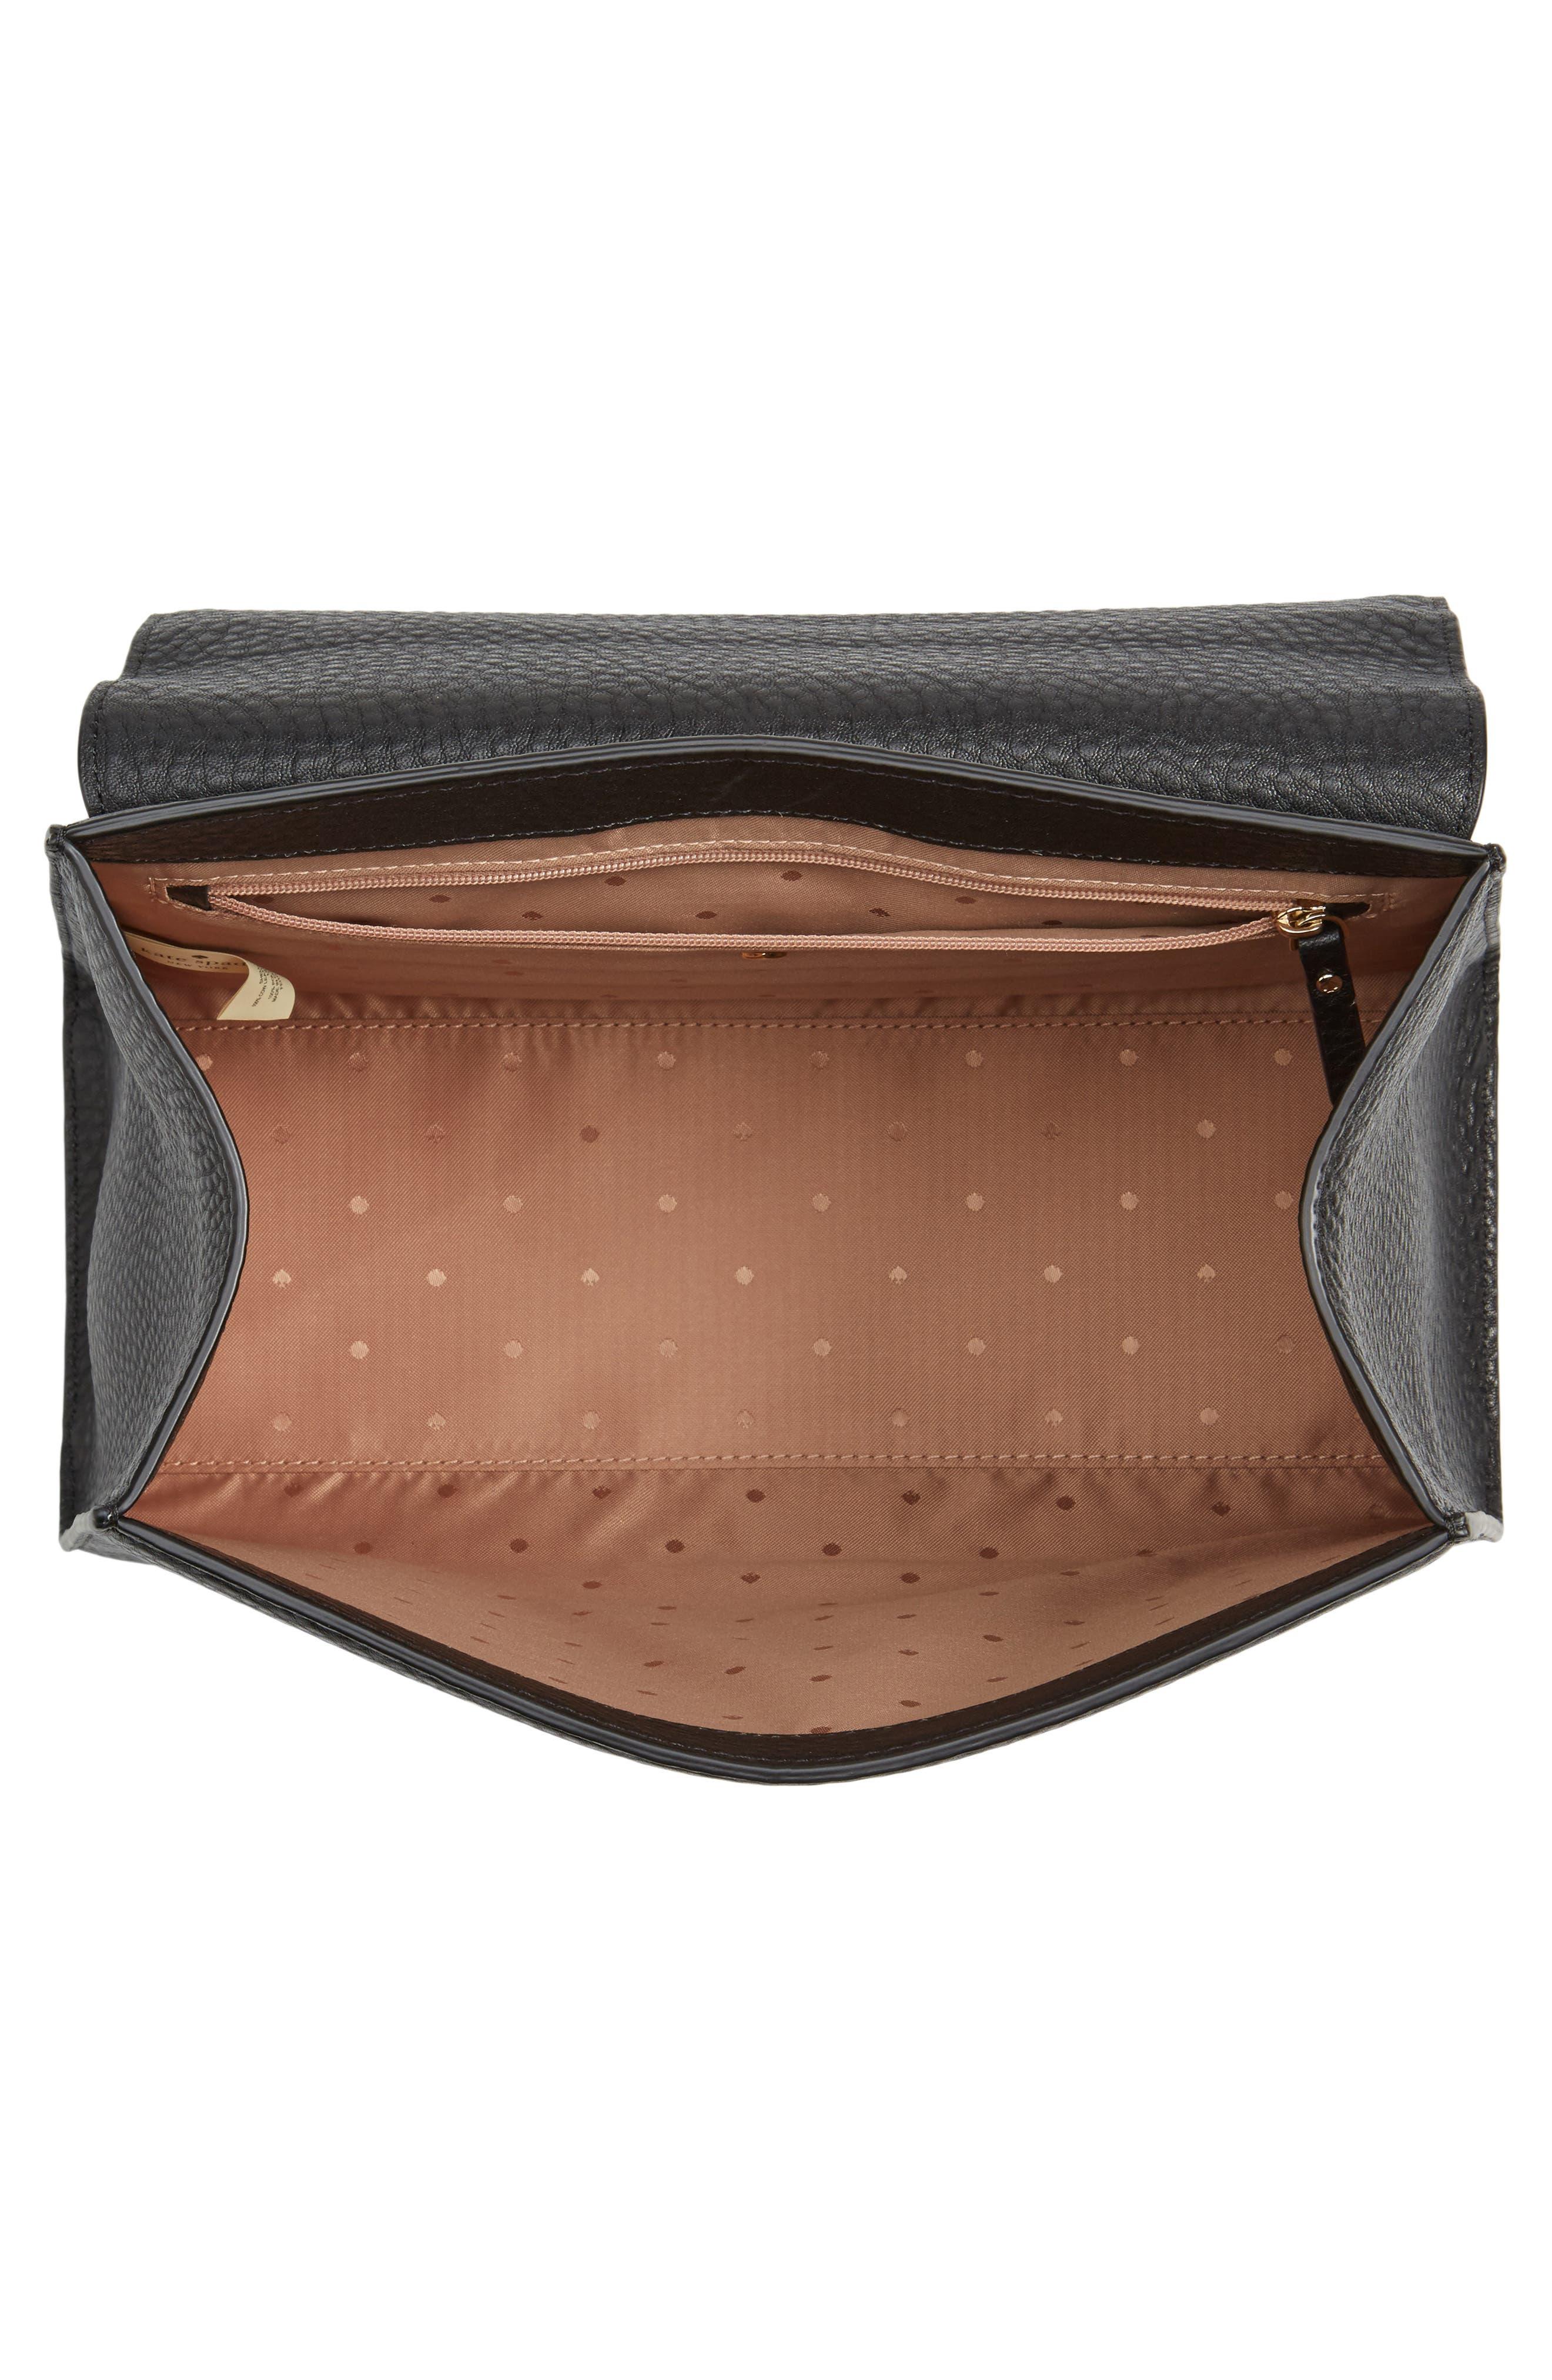 stewart street samira leather top handle satchel,                             Alternate thumbnail 3, color,                             Black